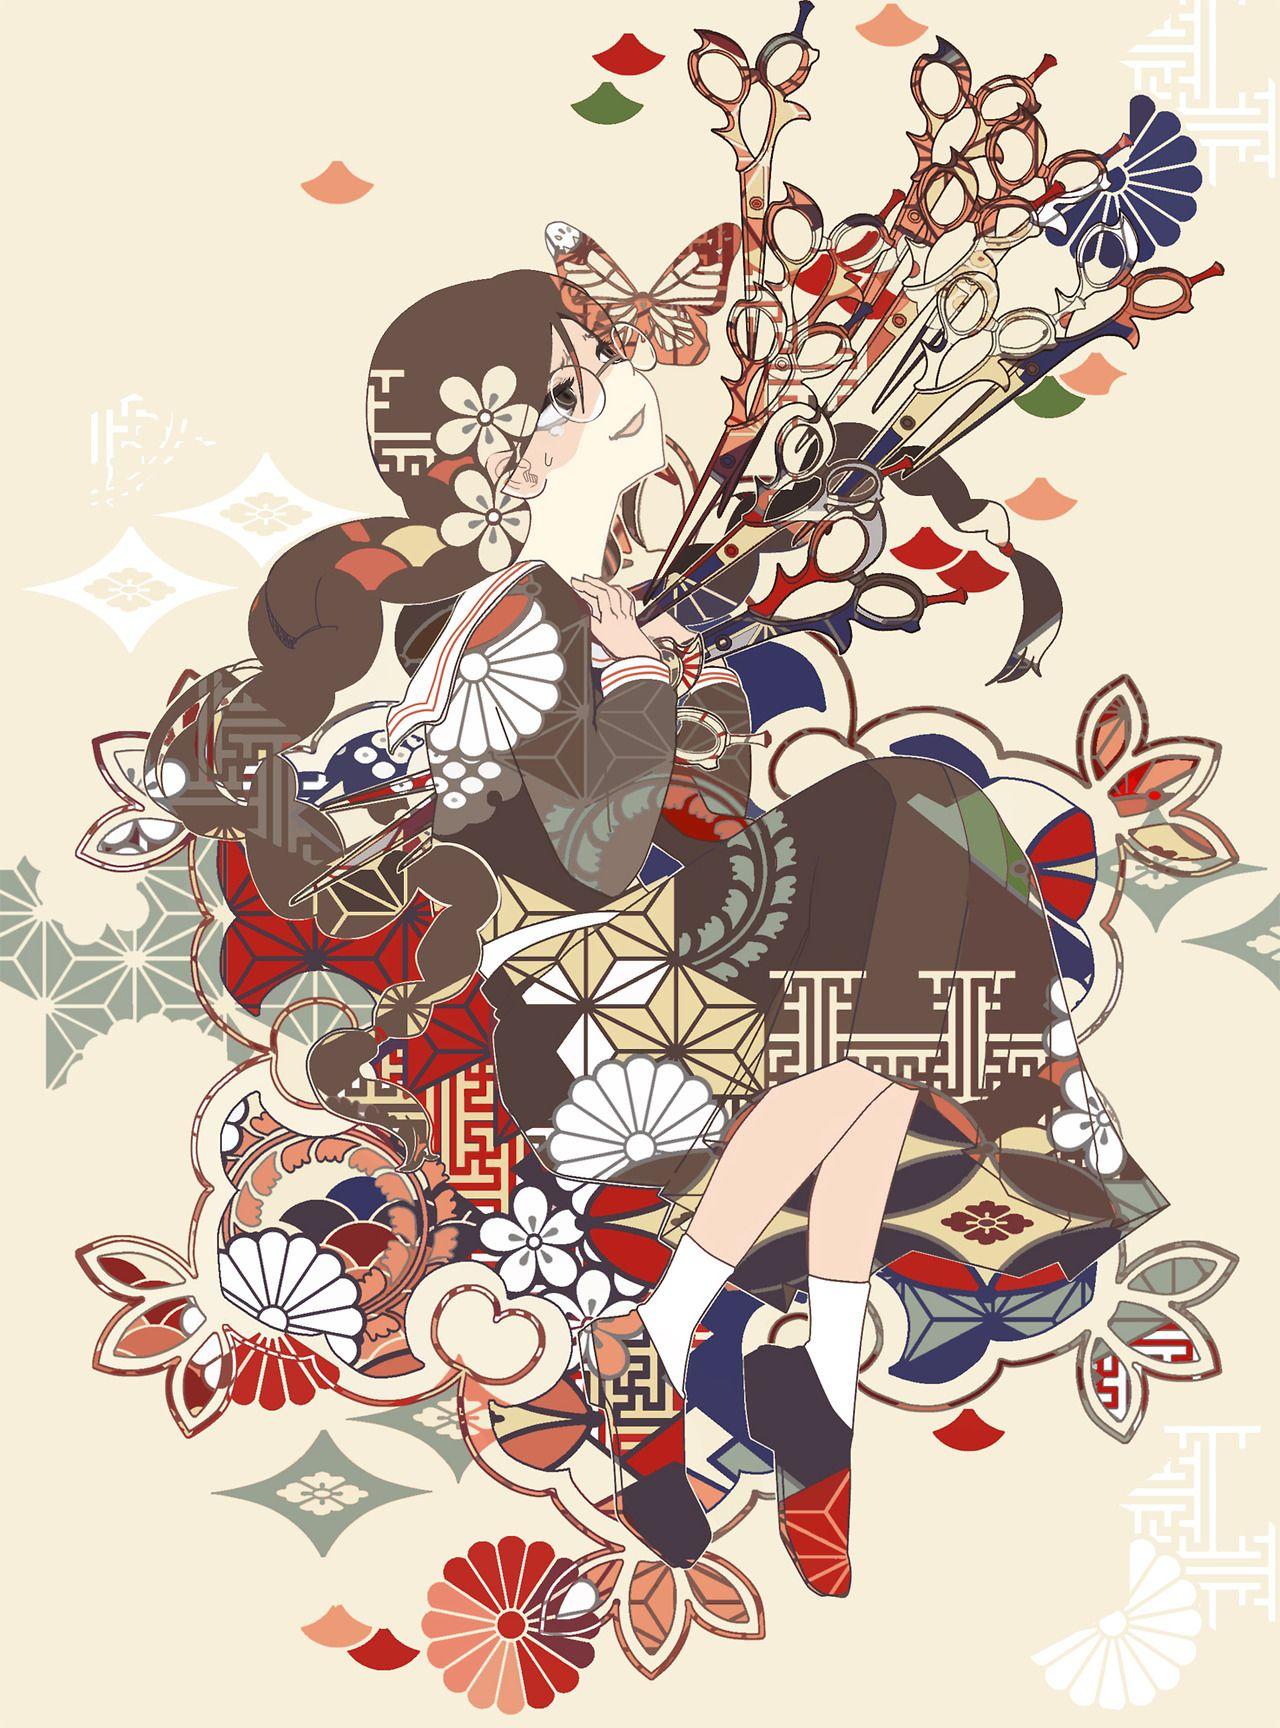 Dangan Ronpa Sakura   art pixiv dangan ronpa Touko Fukawa chihiro fujisaki sakura oogami ...